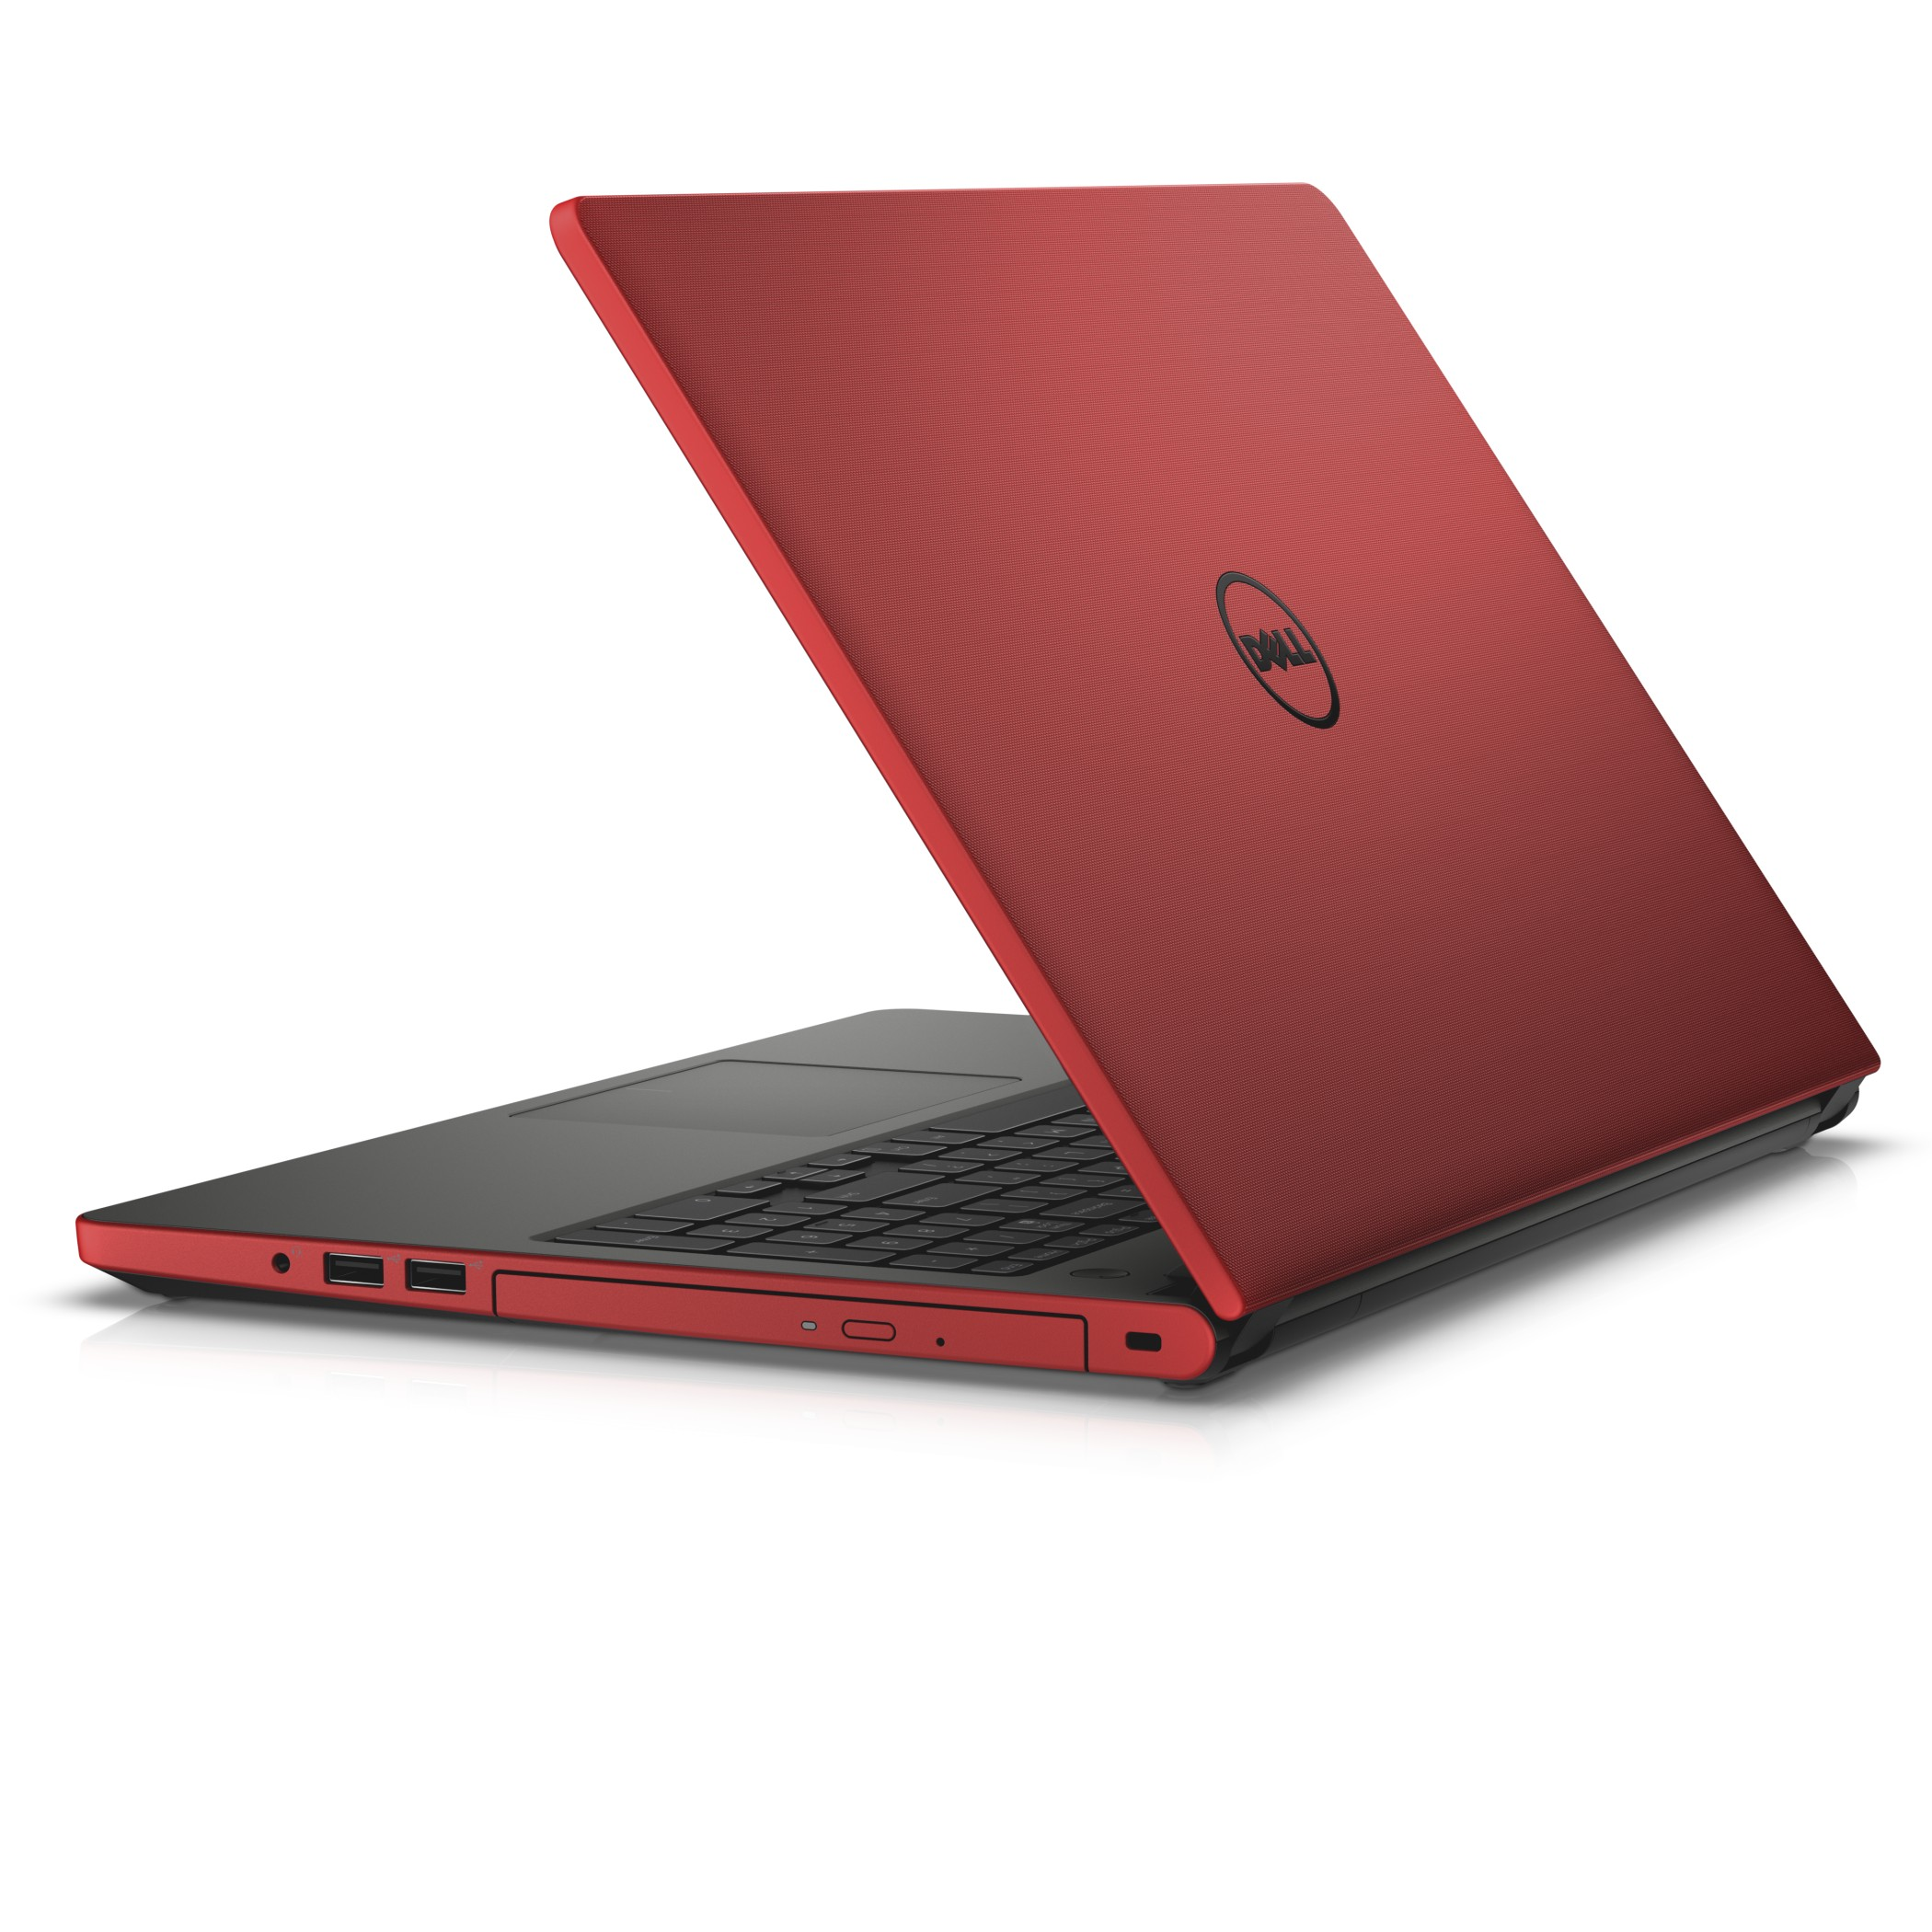 "Dell Inspiron 5558 15"" i3-5005U/4GB/500GB/920M-2G/HDMI/RJ45/WIFI/BT/MCR/W10UPG/2NBD červený"